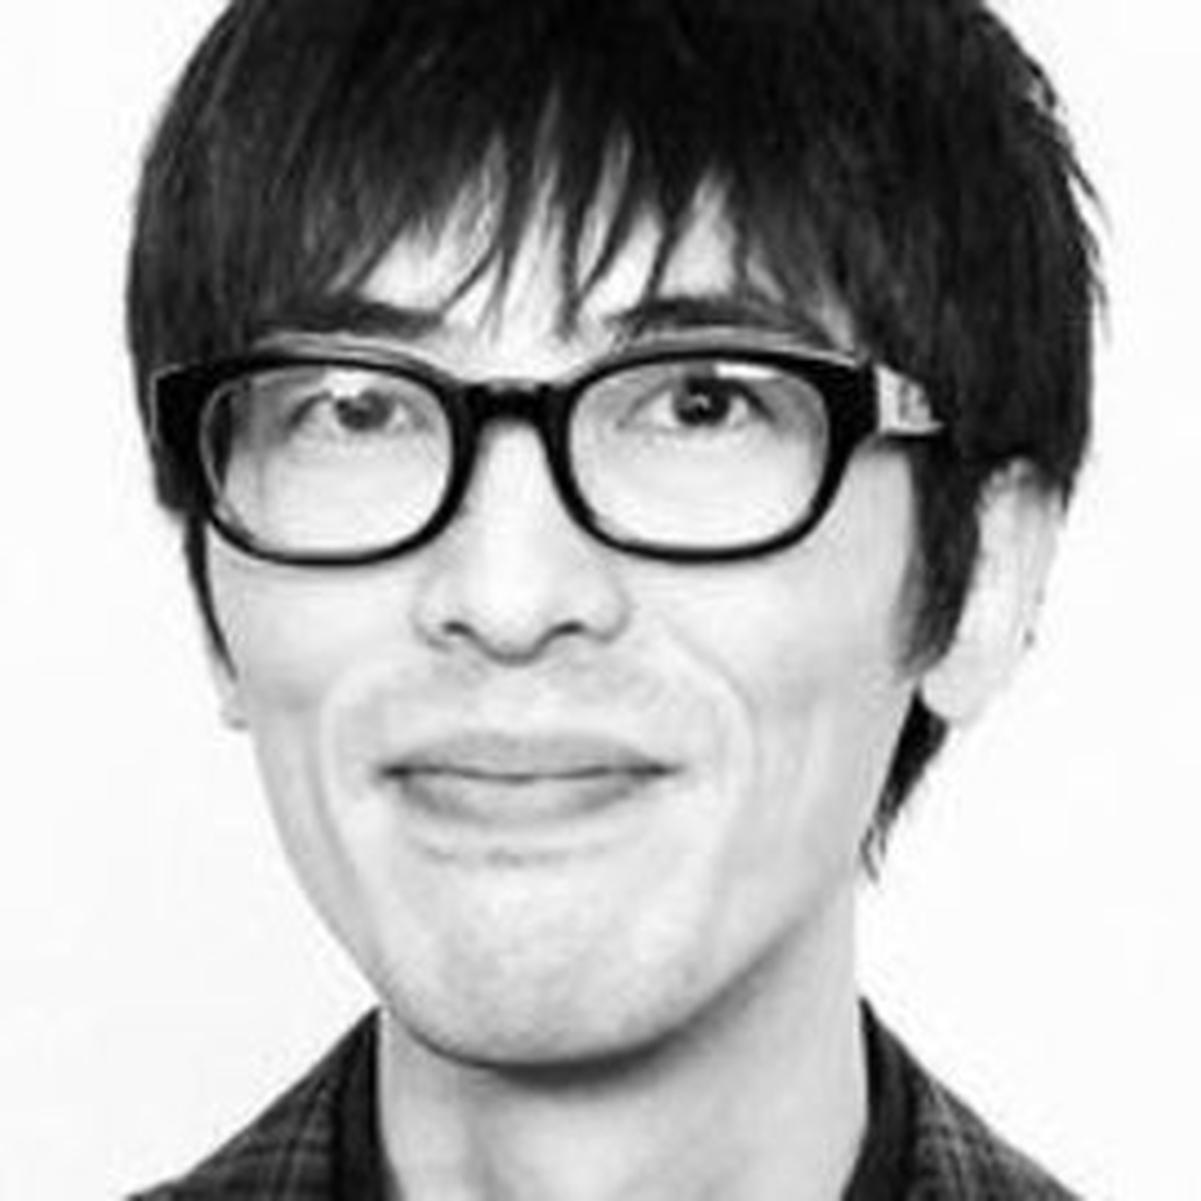 Shimpei Takahashi